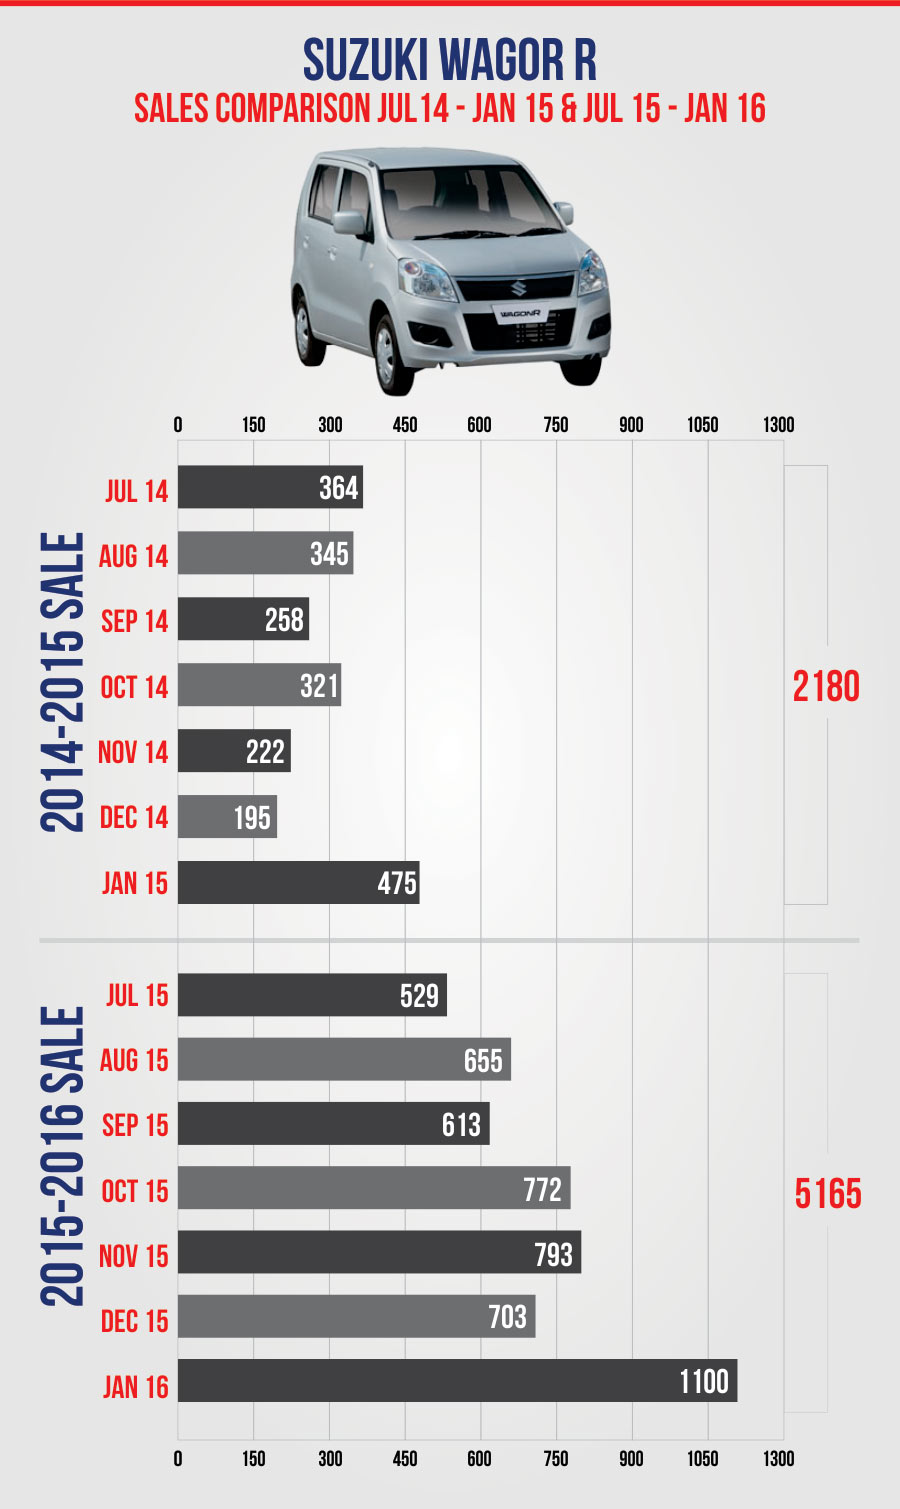 Suzuki Pakistan Wagor-R Sales